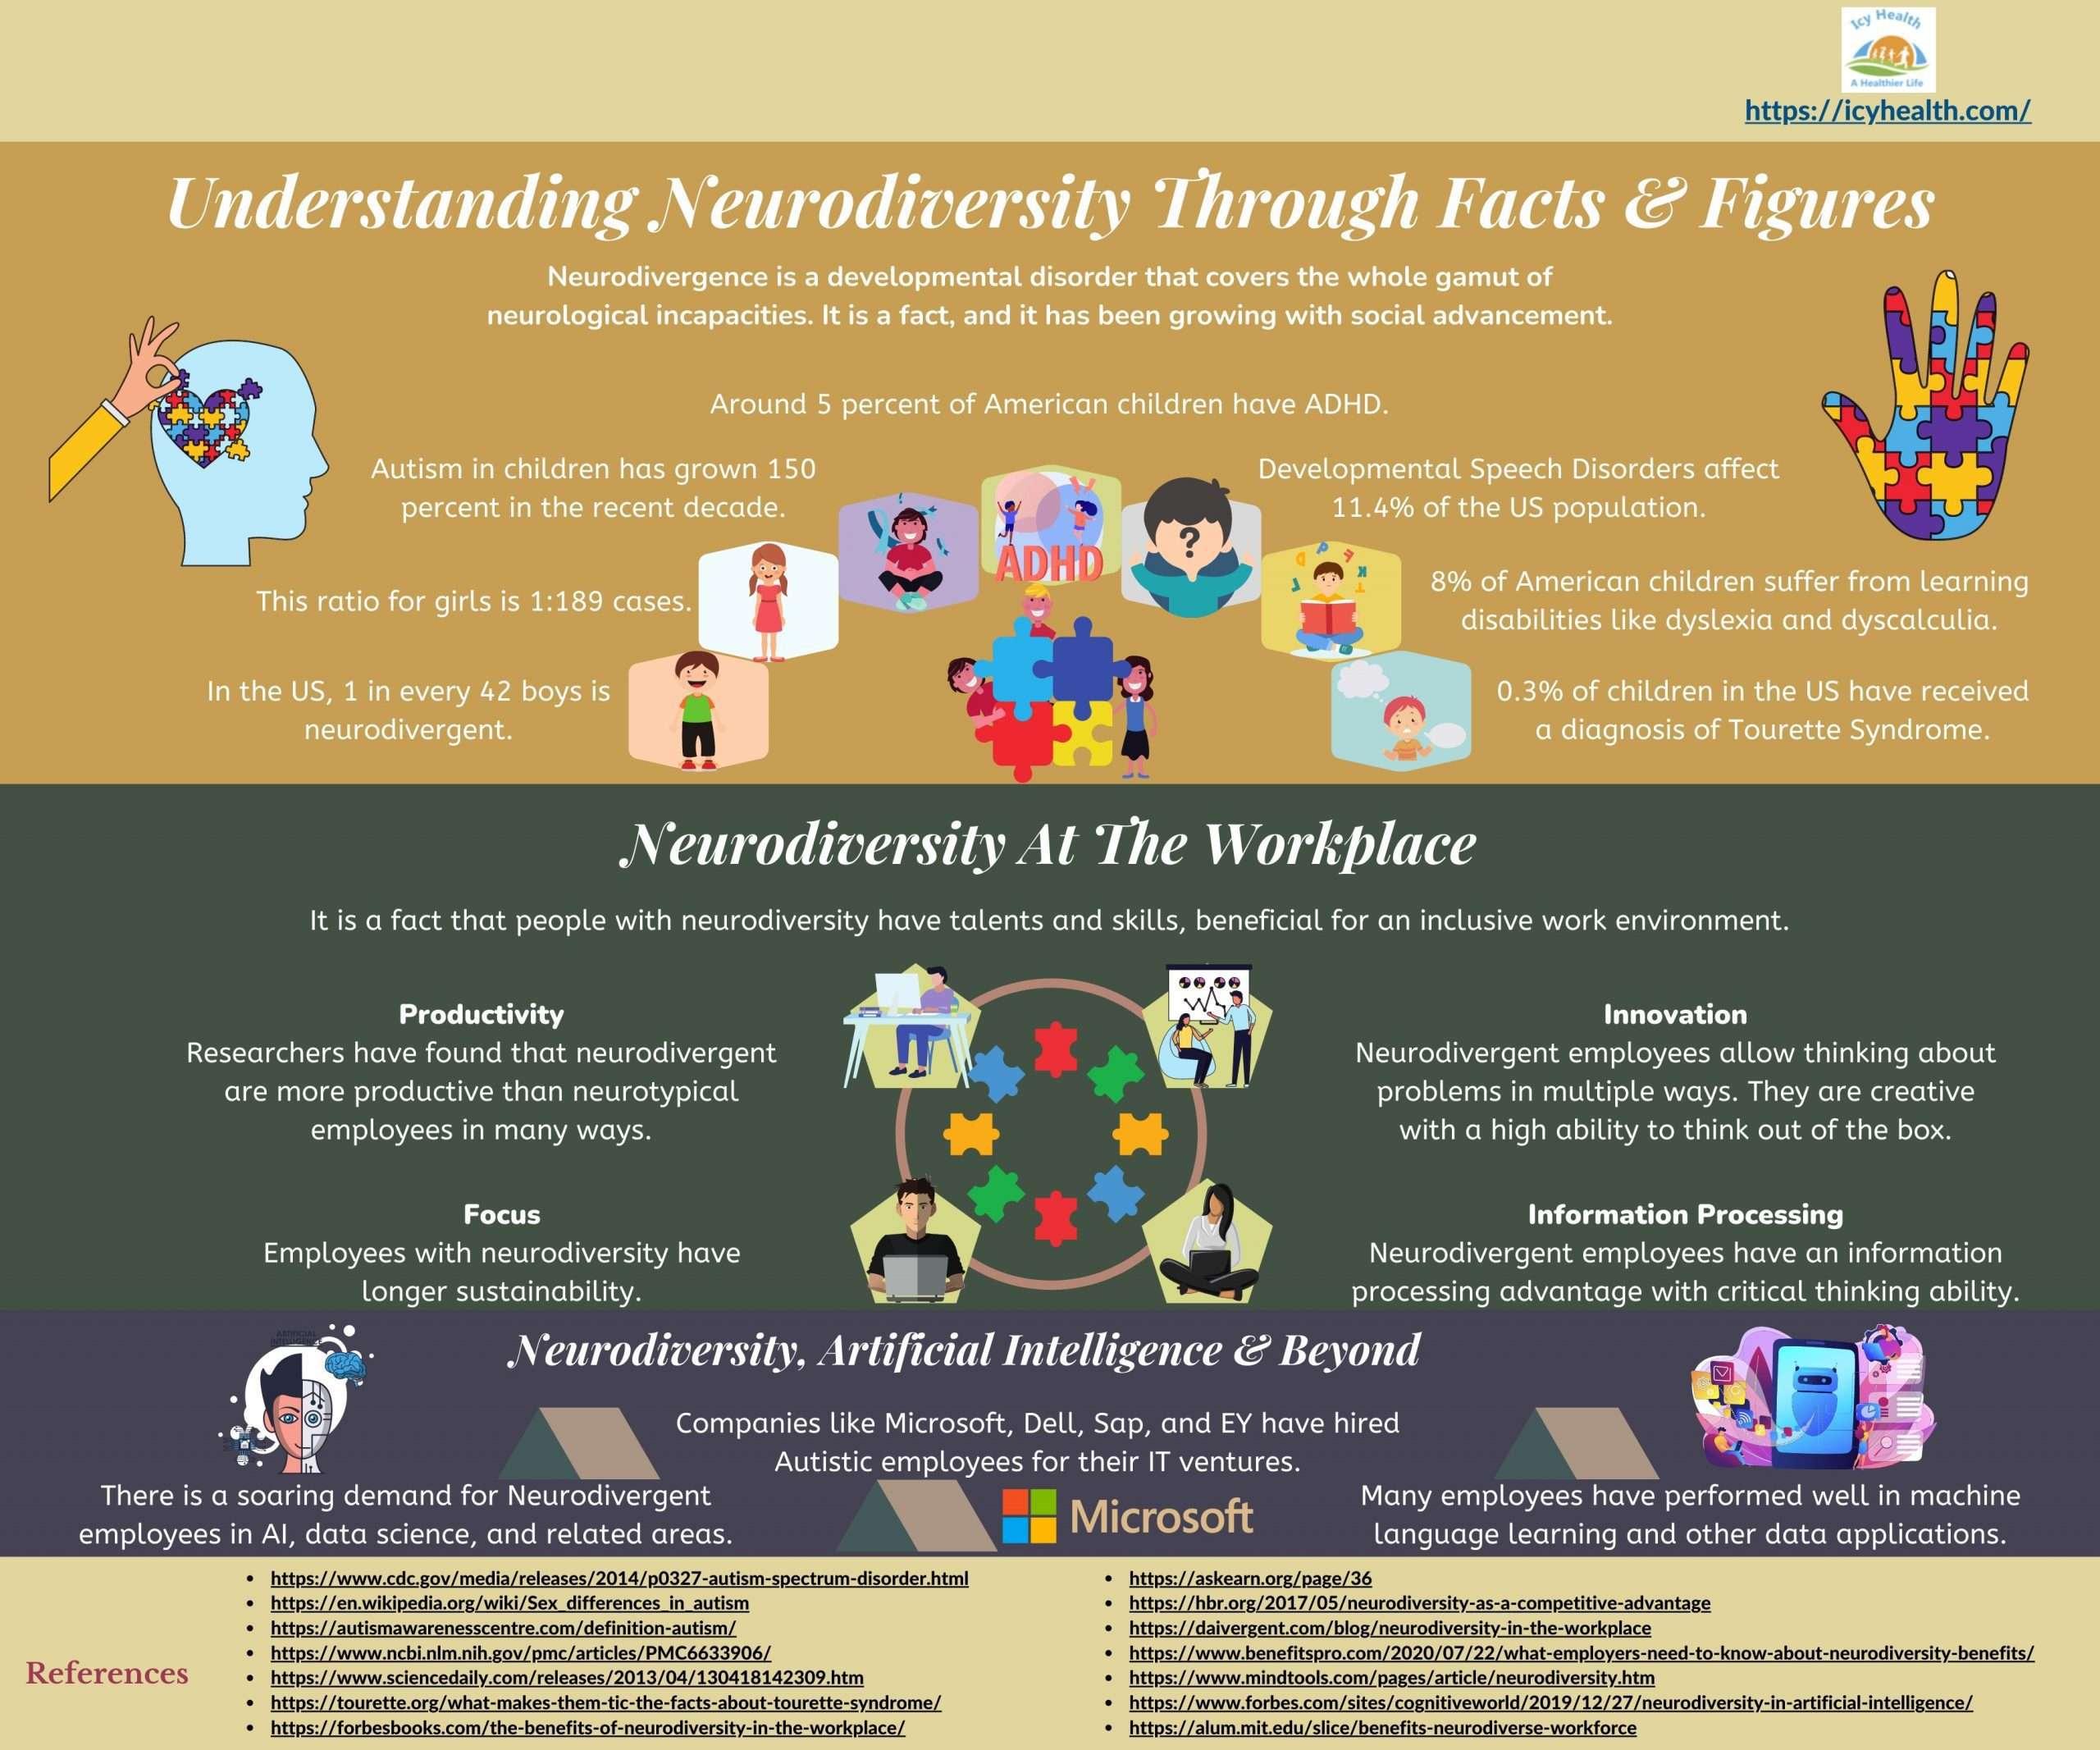 Understanding Neurodiversity Through Facts & Figures